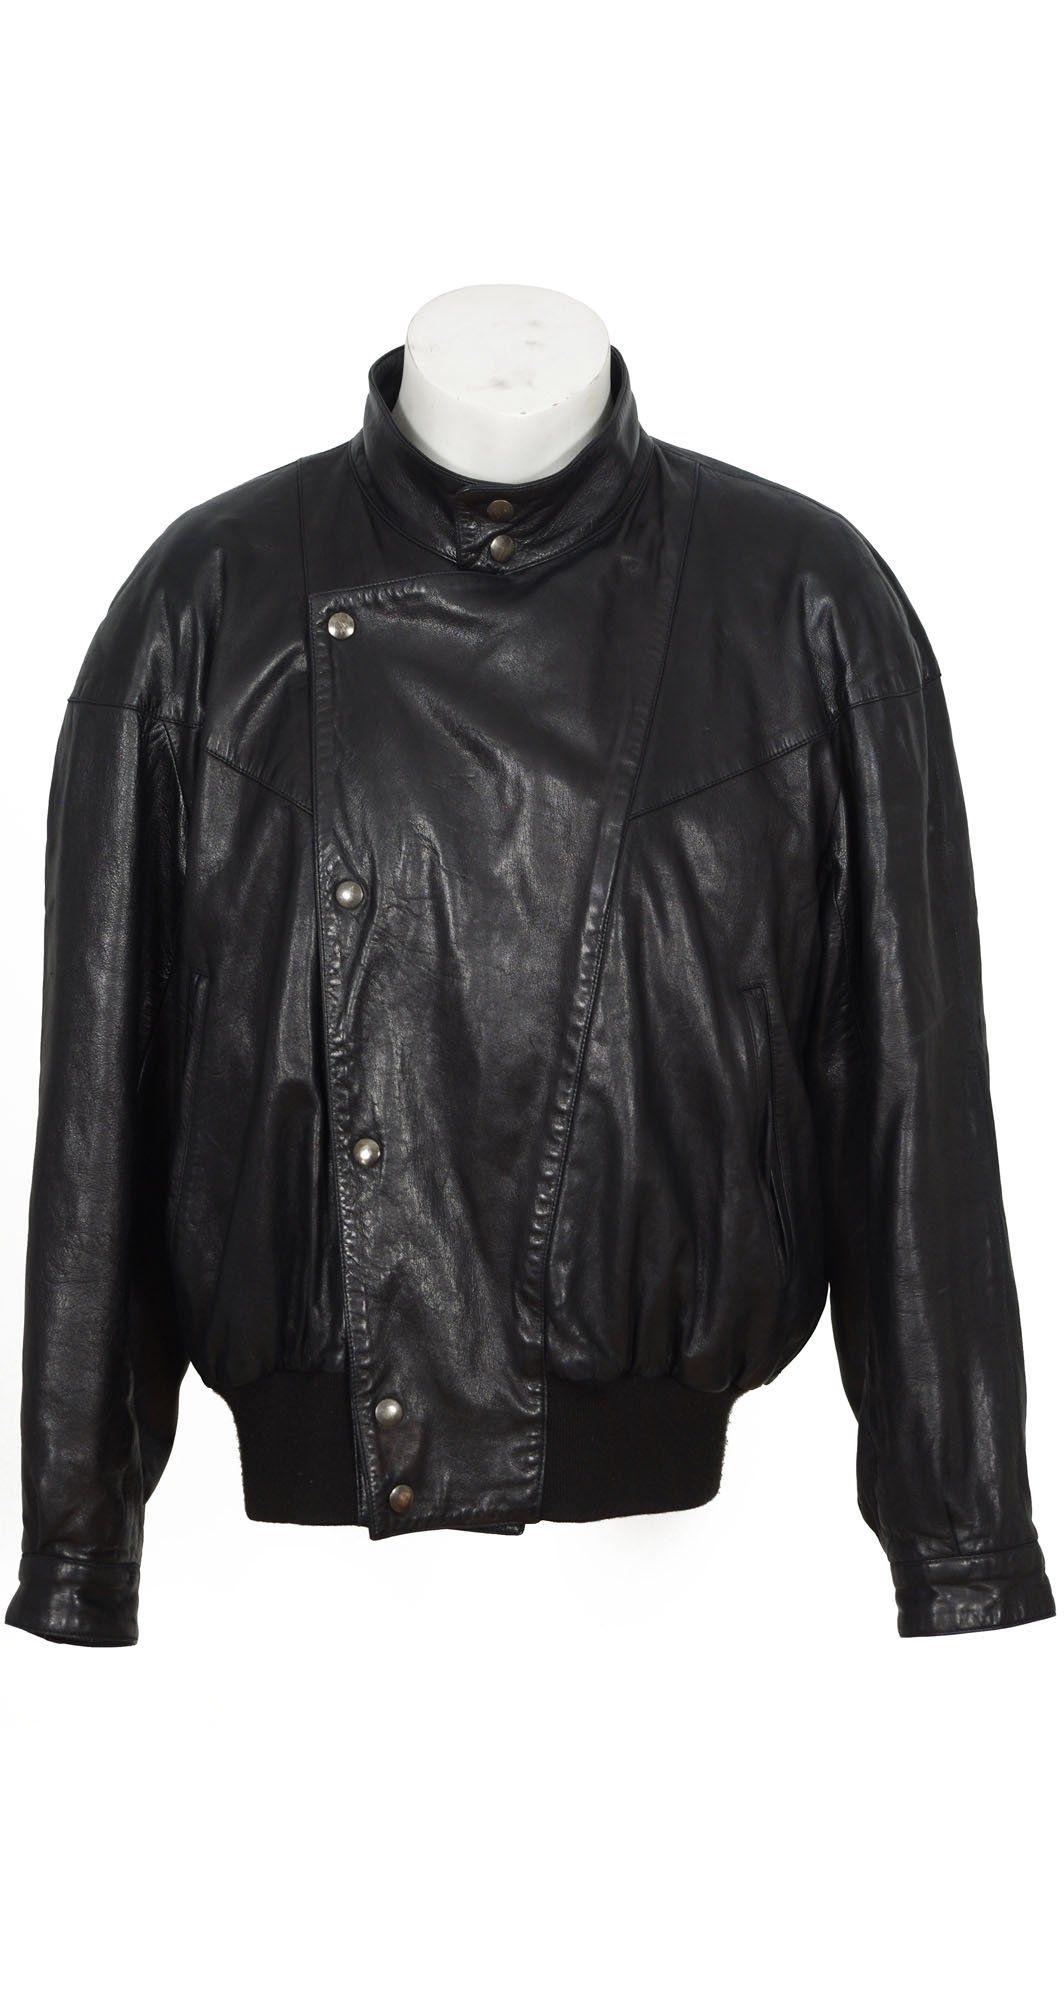 1980s Men S Ideal Cuir Black Leather Jacket Leather Jacket Men Leather Jacket Brown Leather Jacket Men